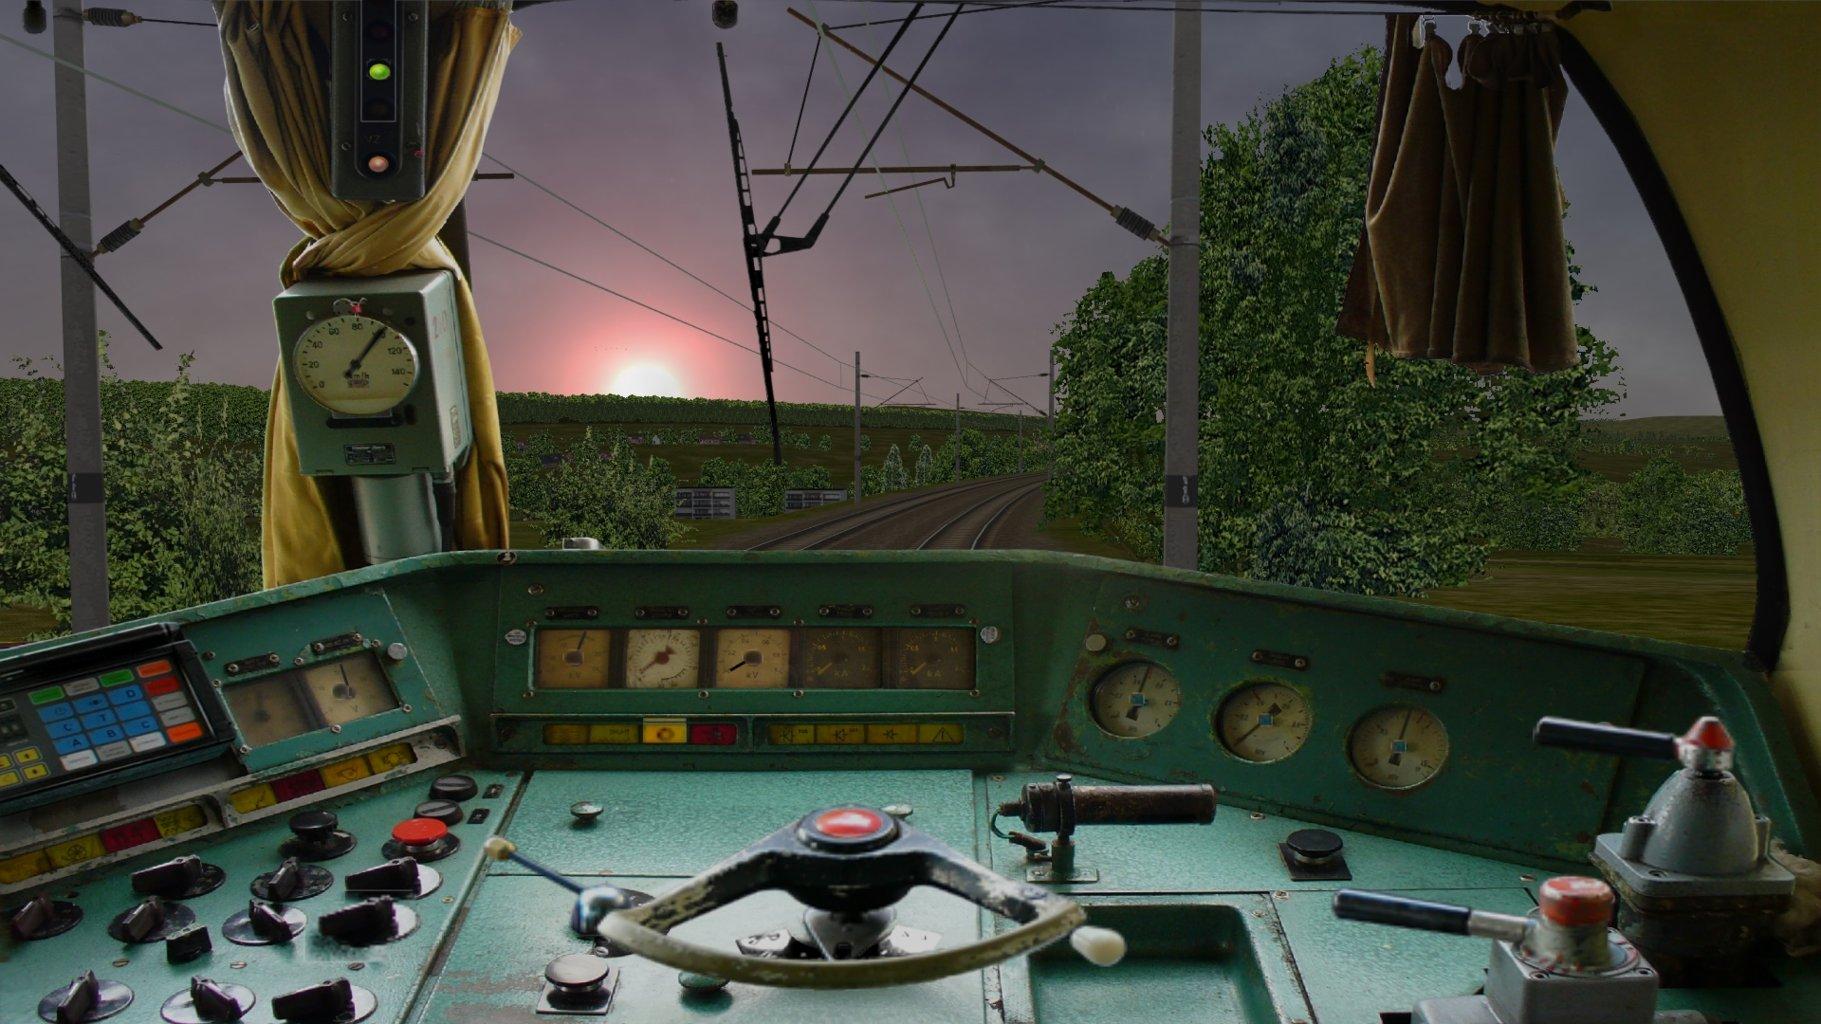 Open Rails 2021-04-06 09-11-32.jpg